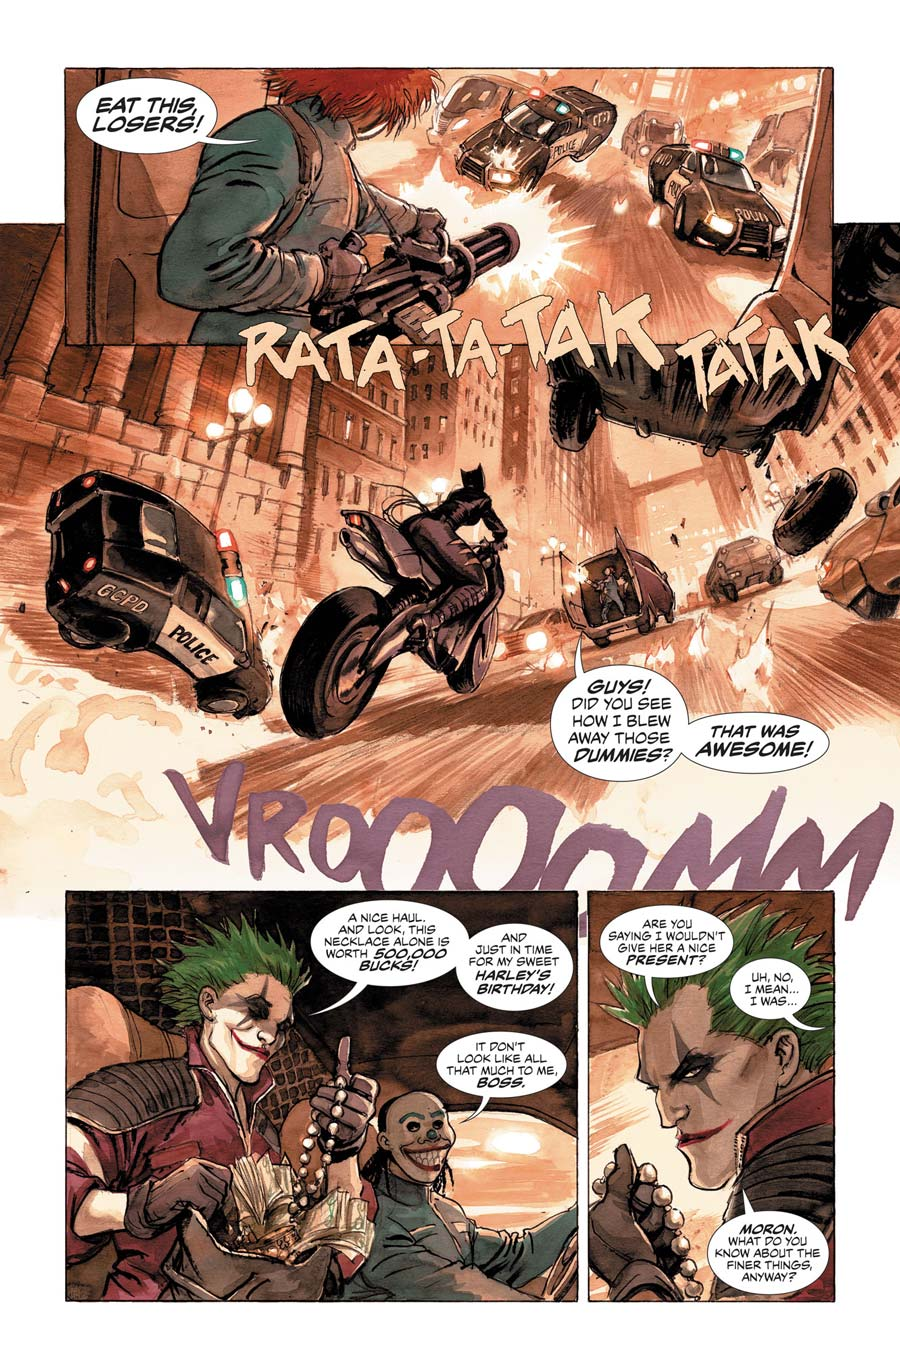 [Imagen: Batman-Principe-Oscuro-1-05.jpg]